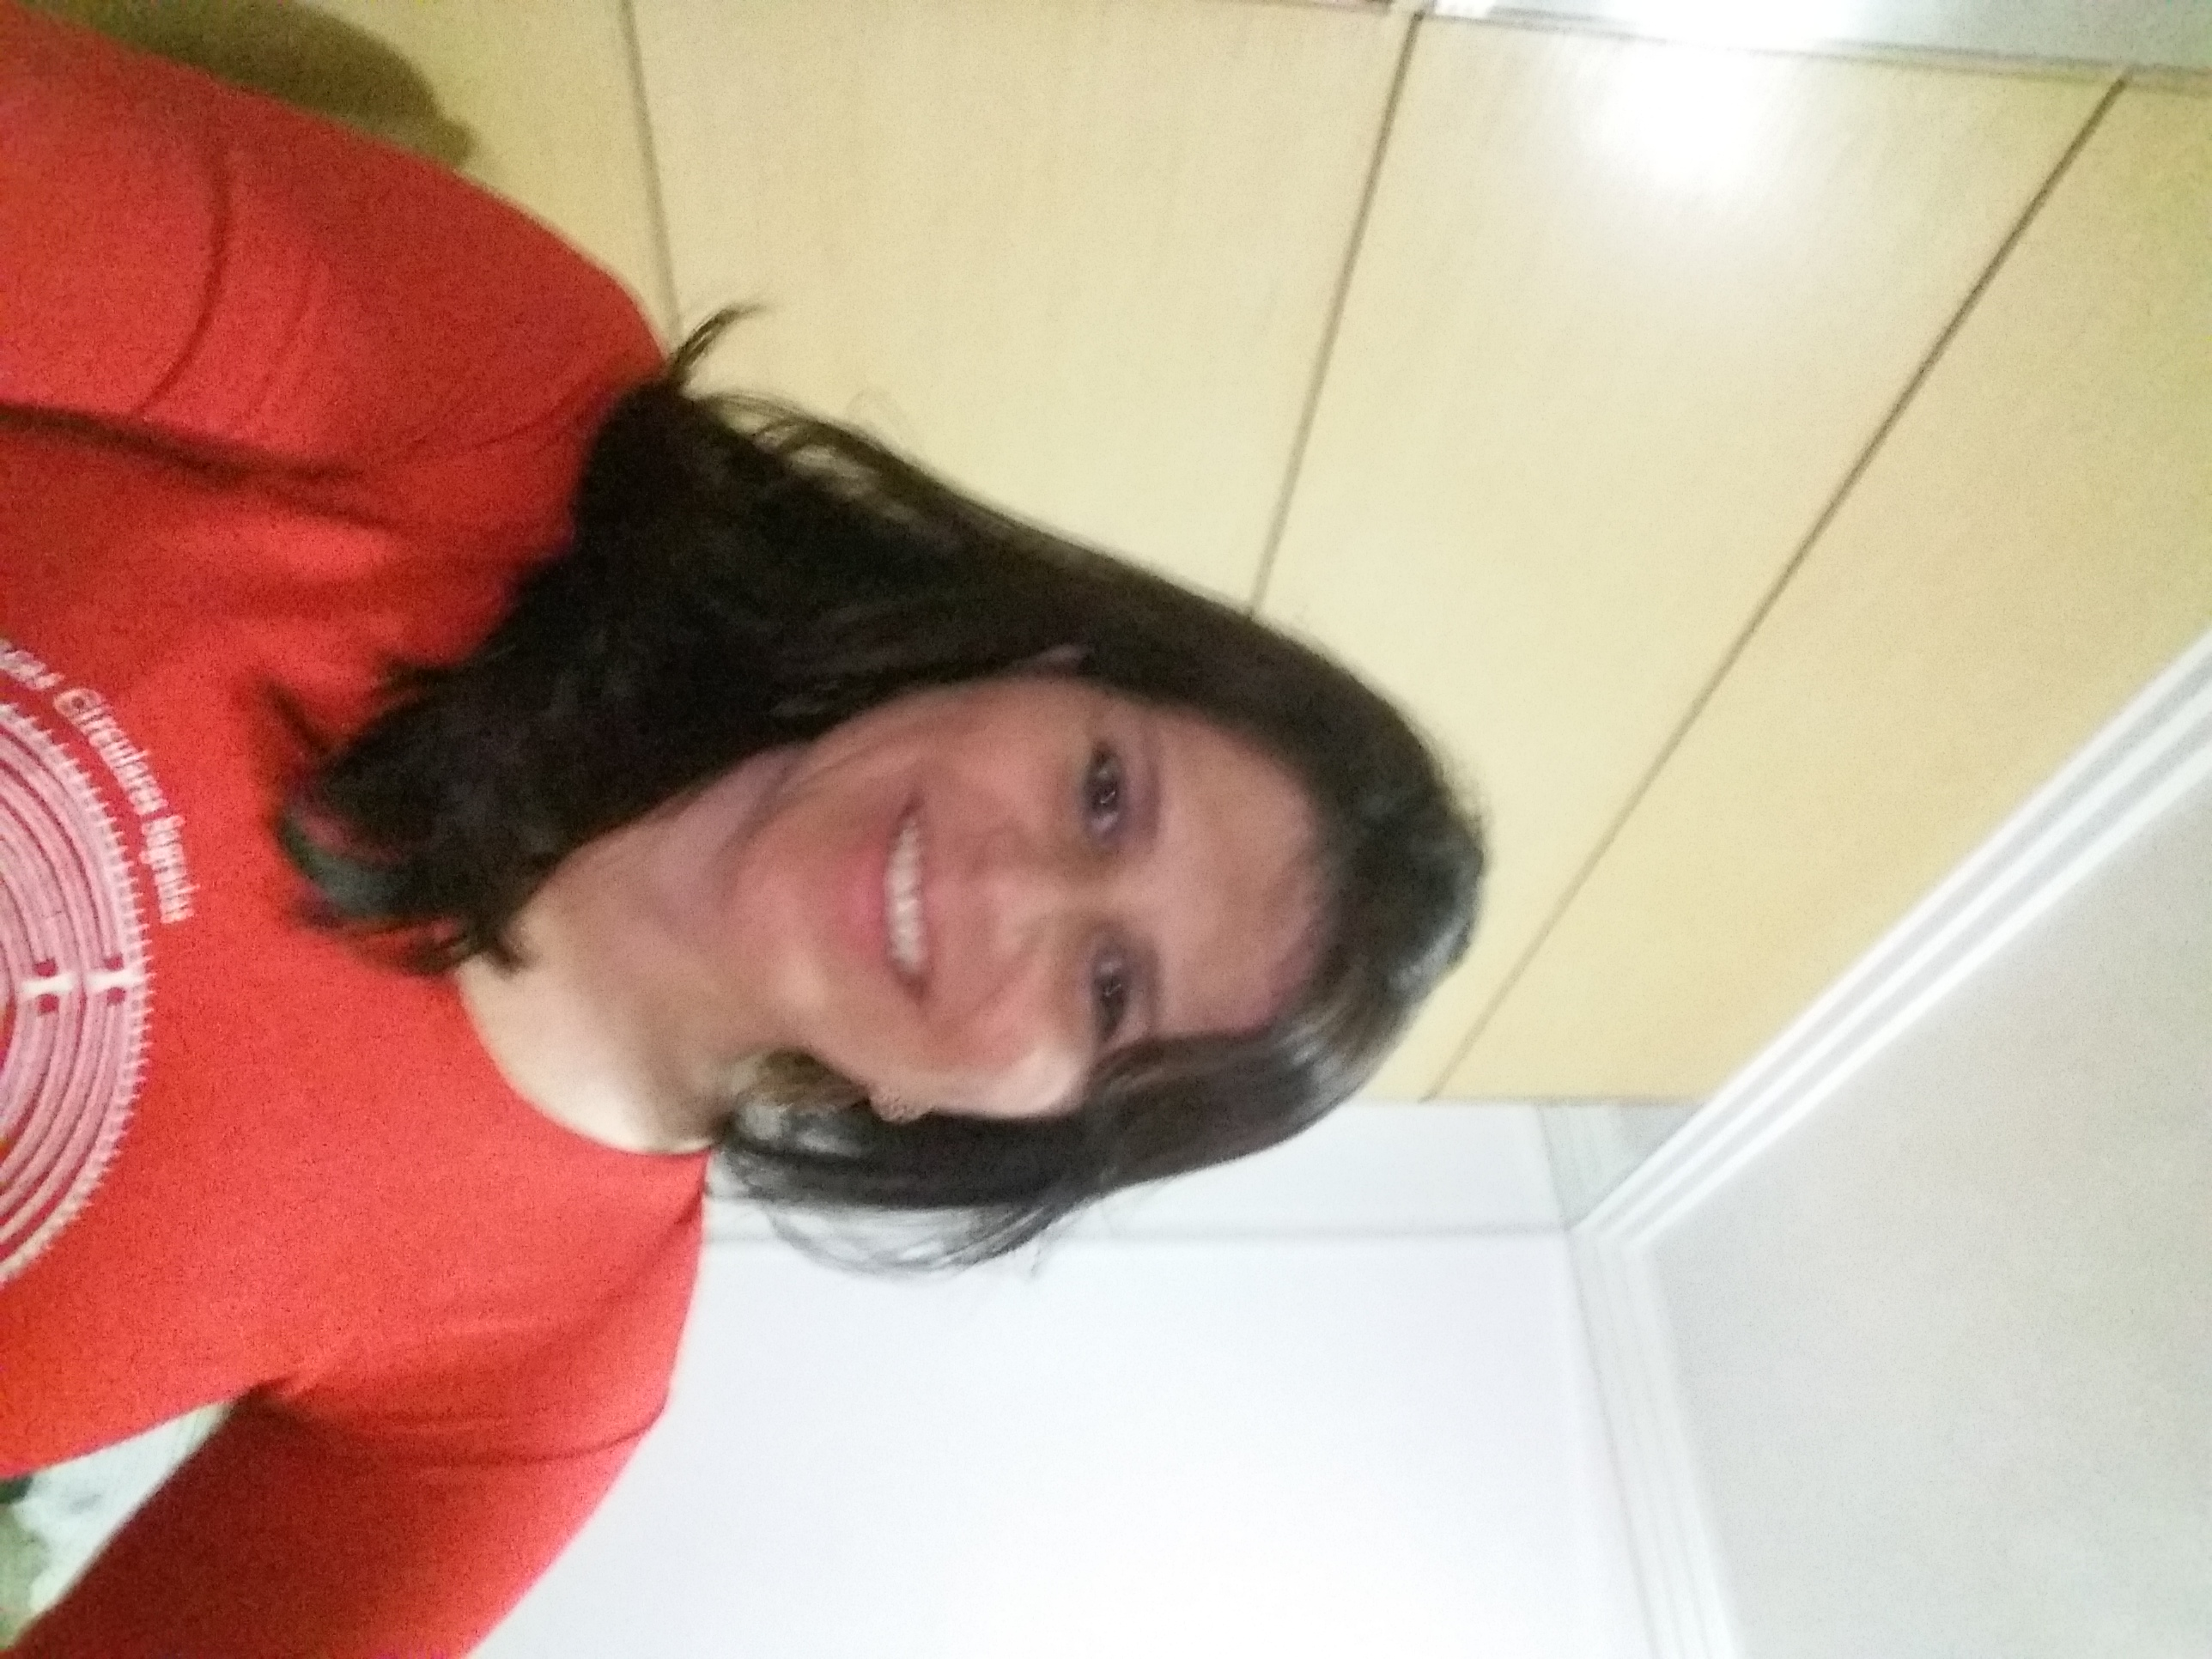 Maria Betânia de SOUZA MENDONÇA